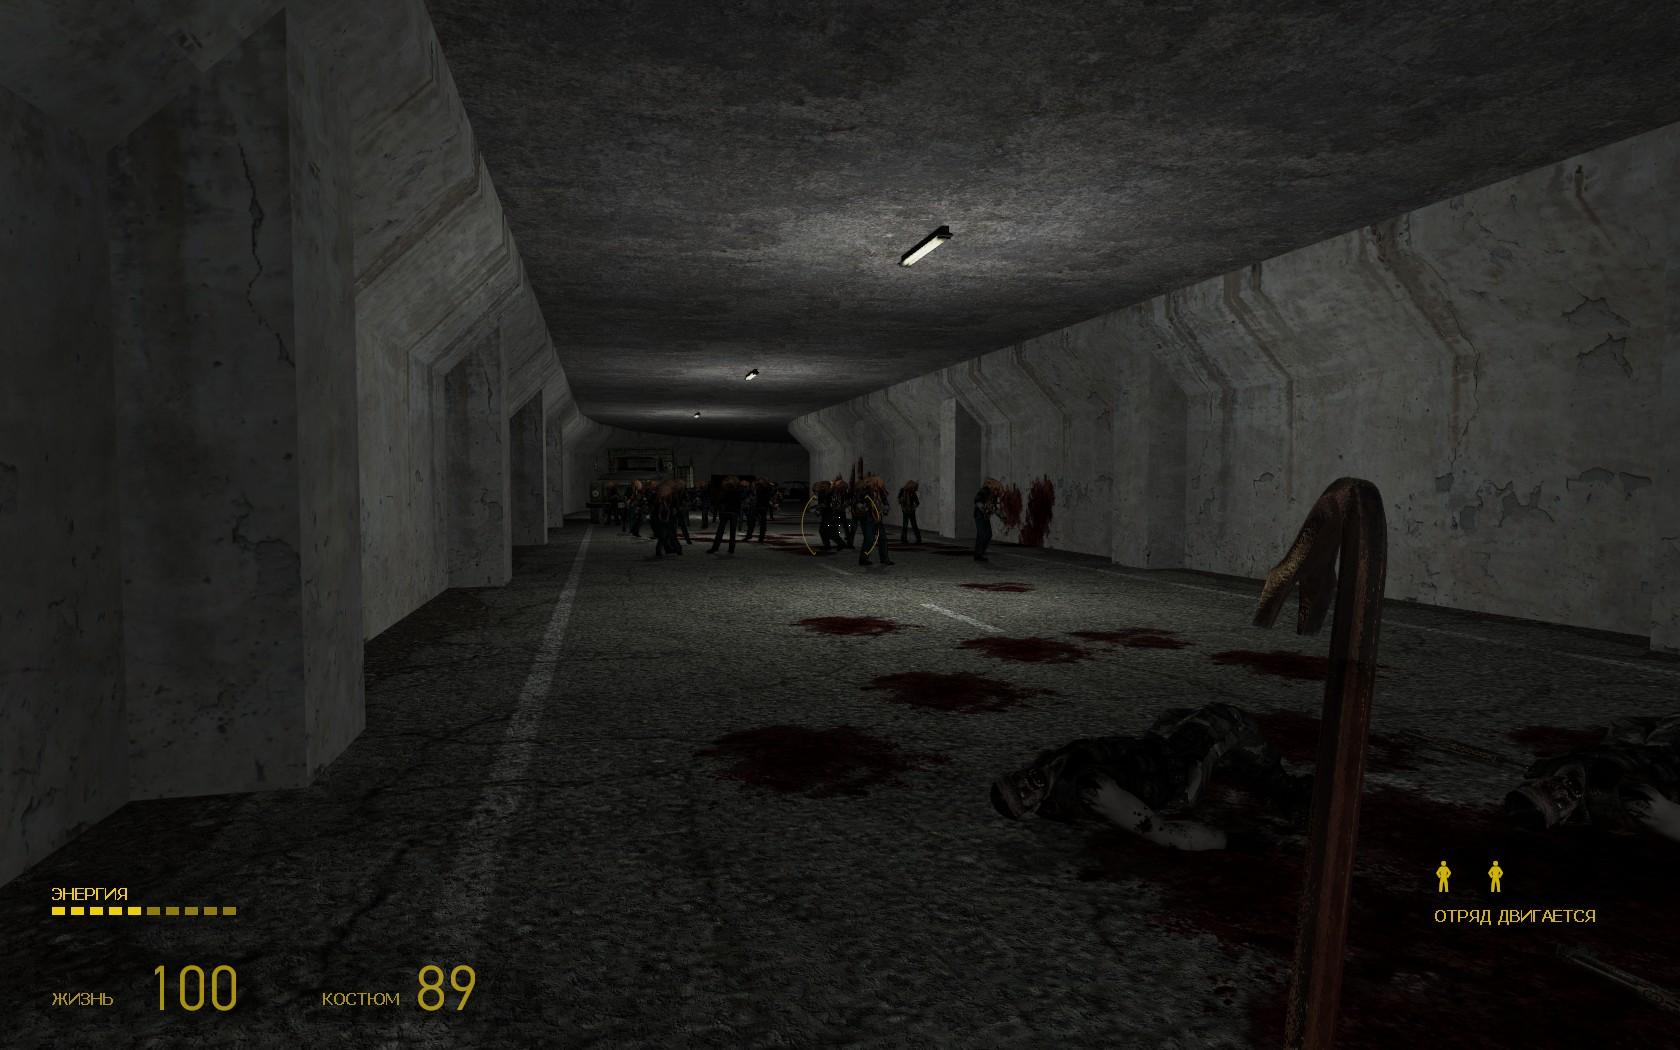 ravenholmlc40015 - Half-Life 2 ravenholmlc40015